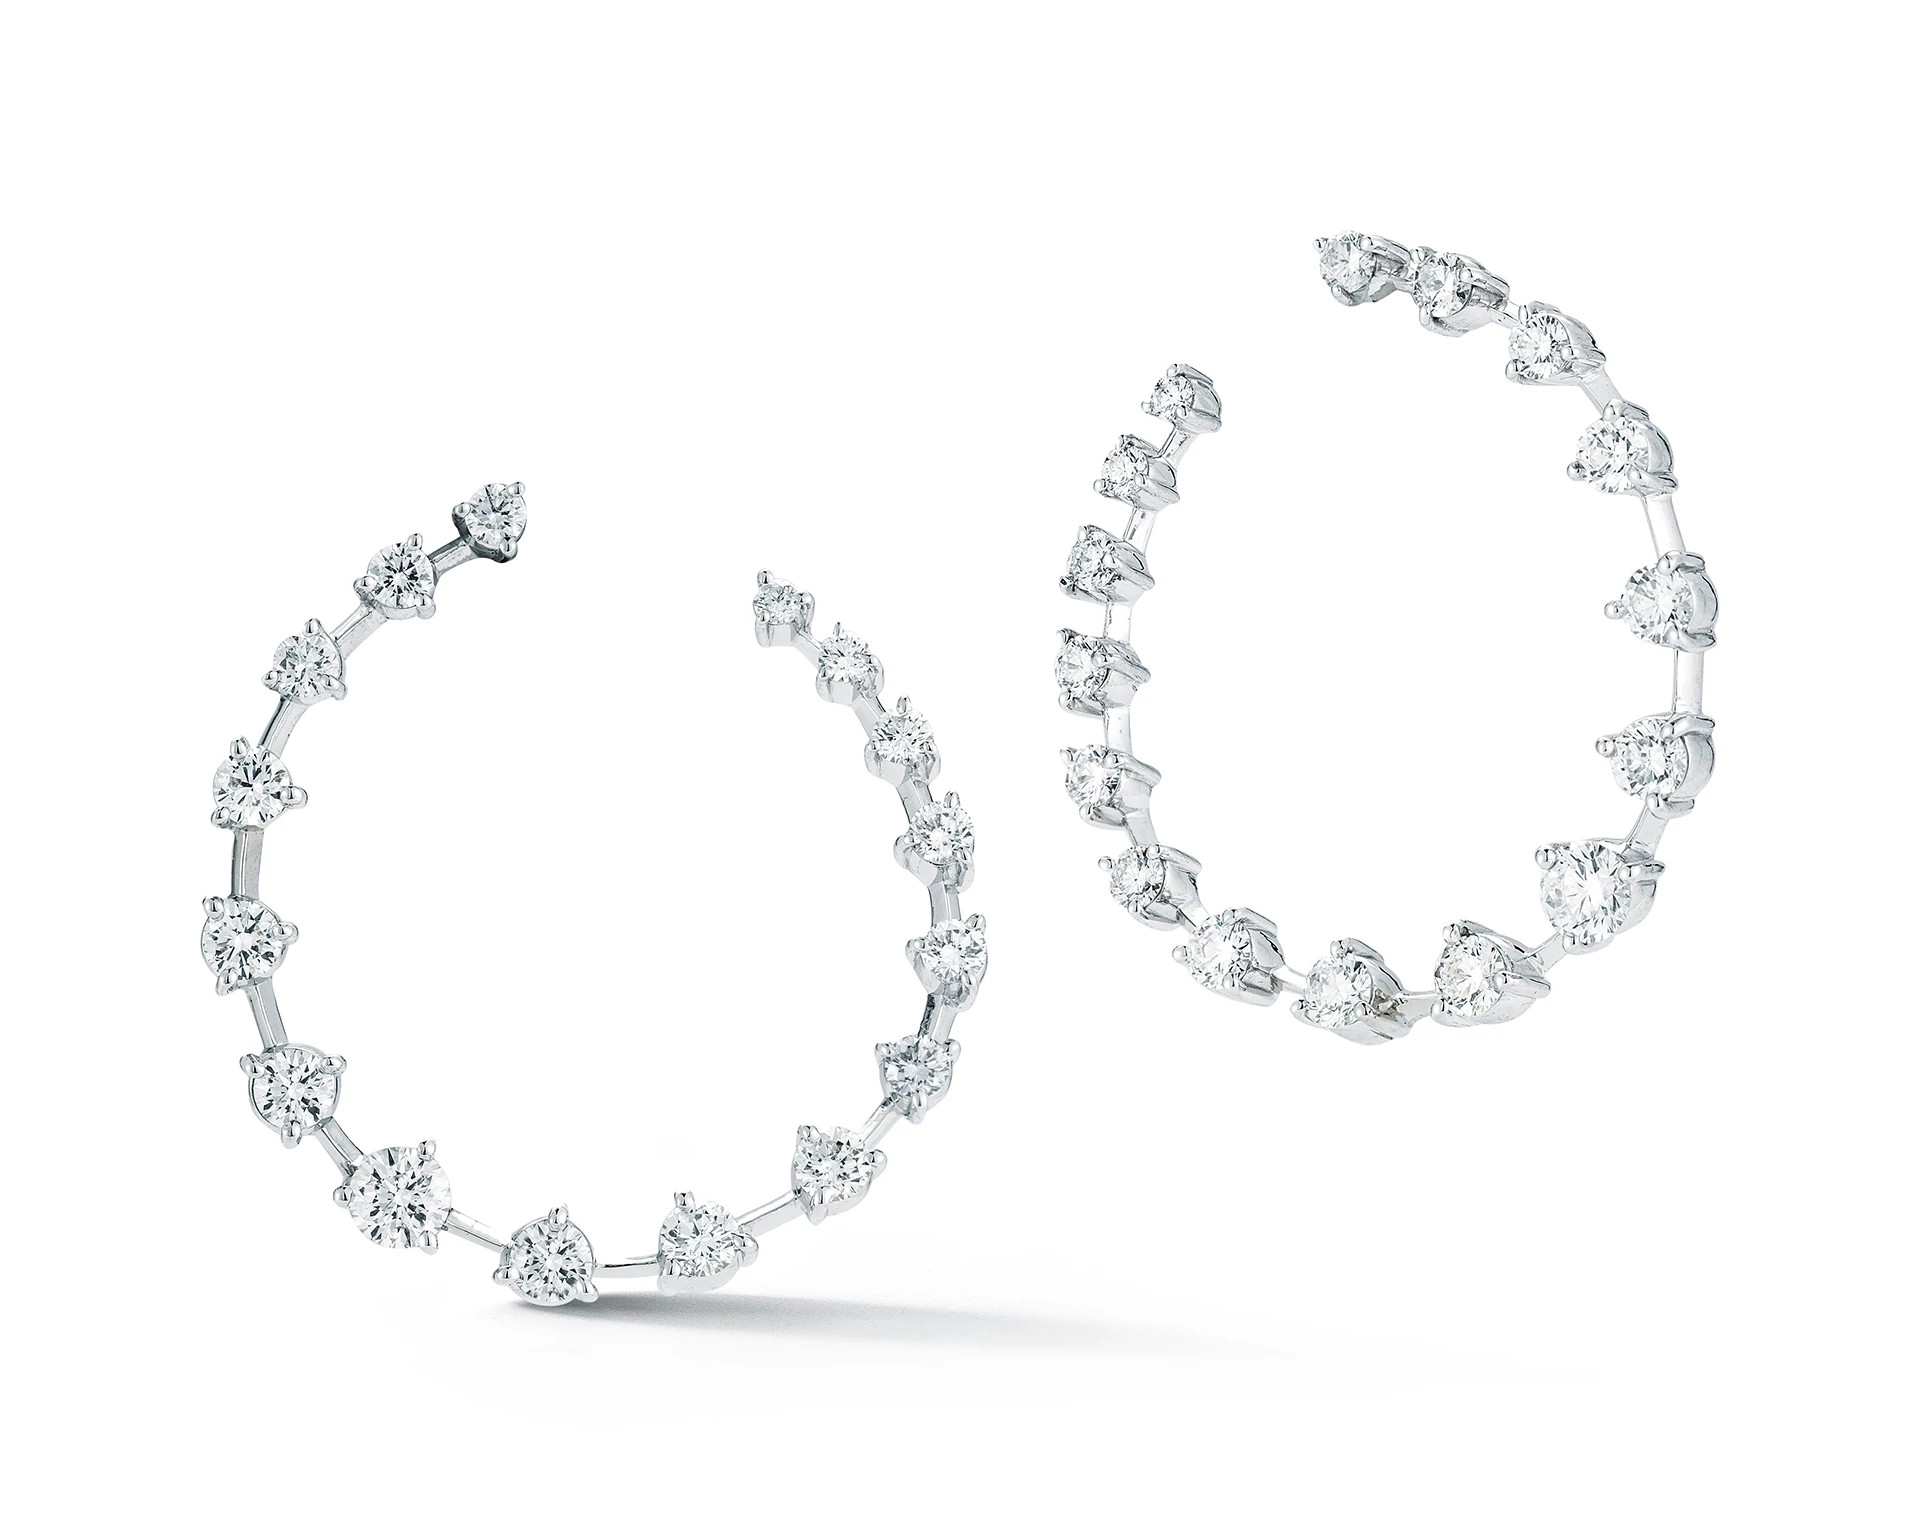 Jade Trau 18K白金镶天然钻石月牙耳环